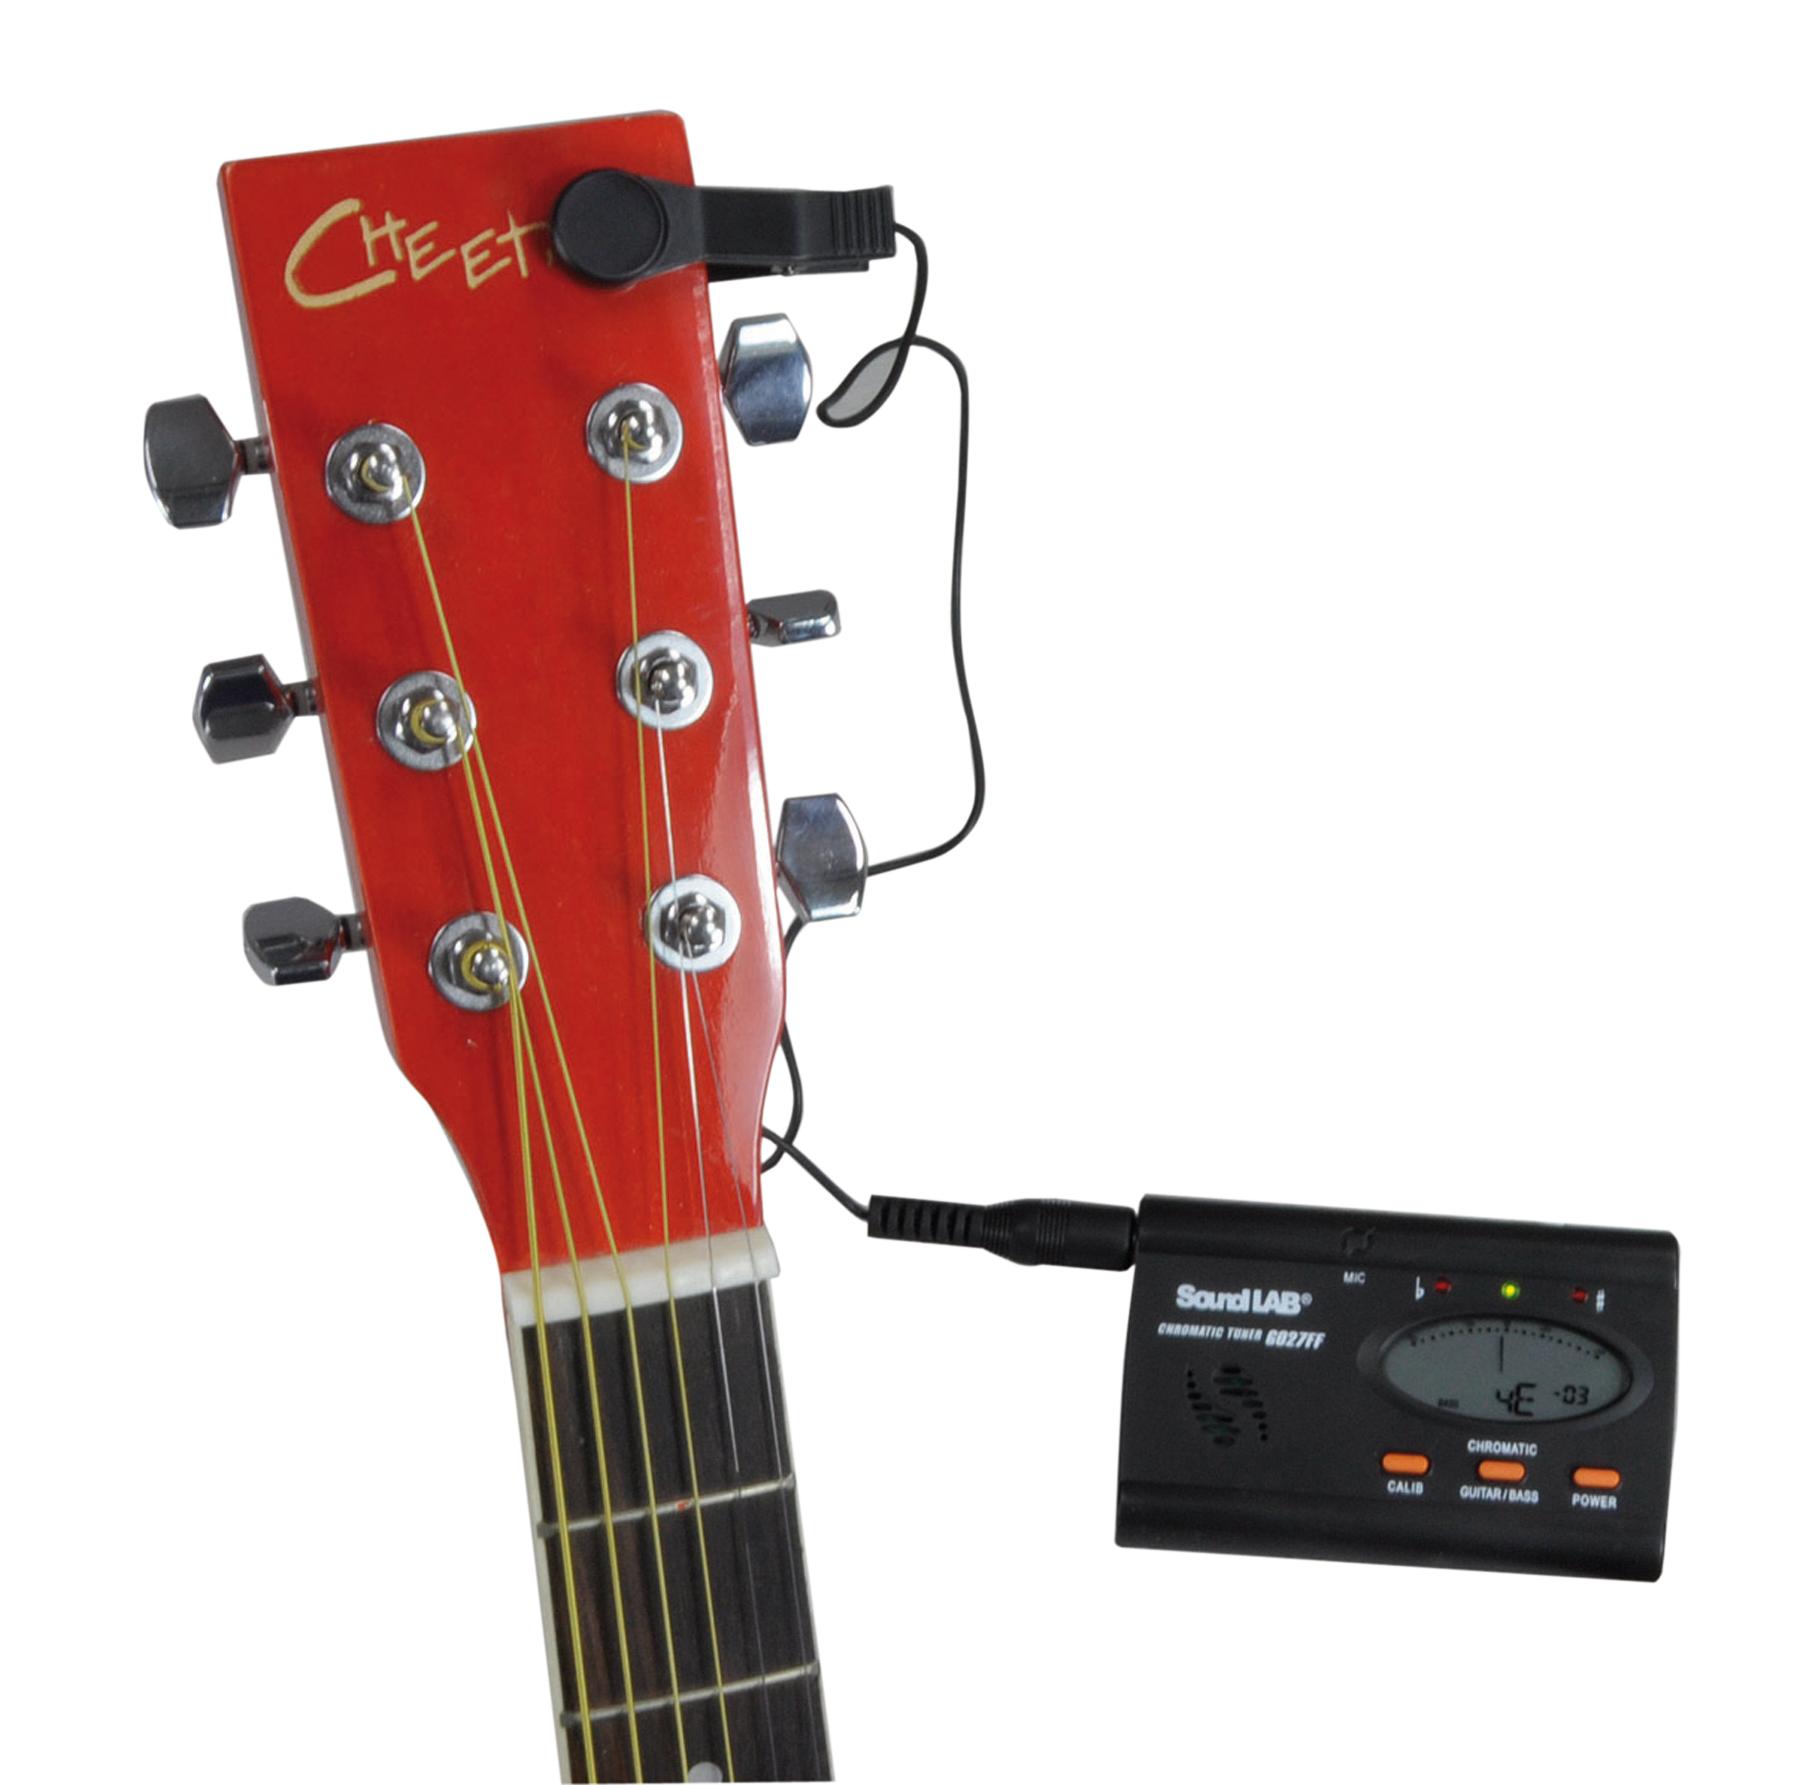 imustbuy soundlab guitar tuner contact microphone ebay. Black Bedroom Furniture Sets. Home Design Ideas